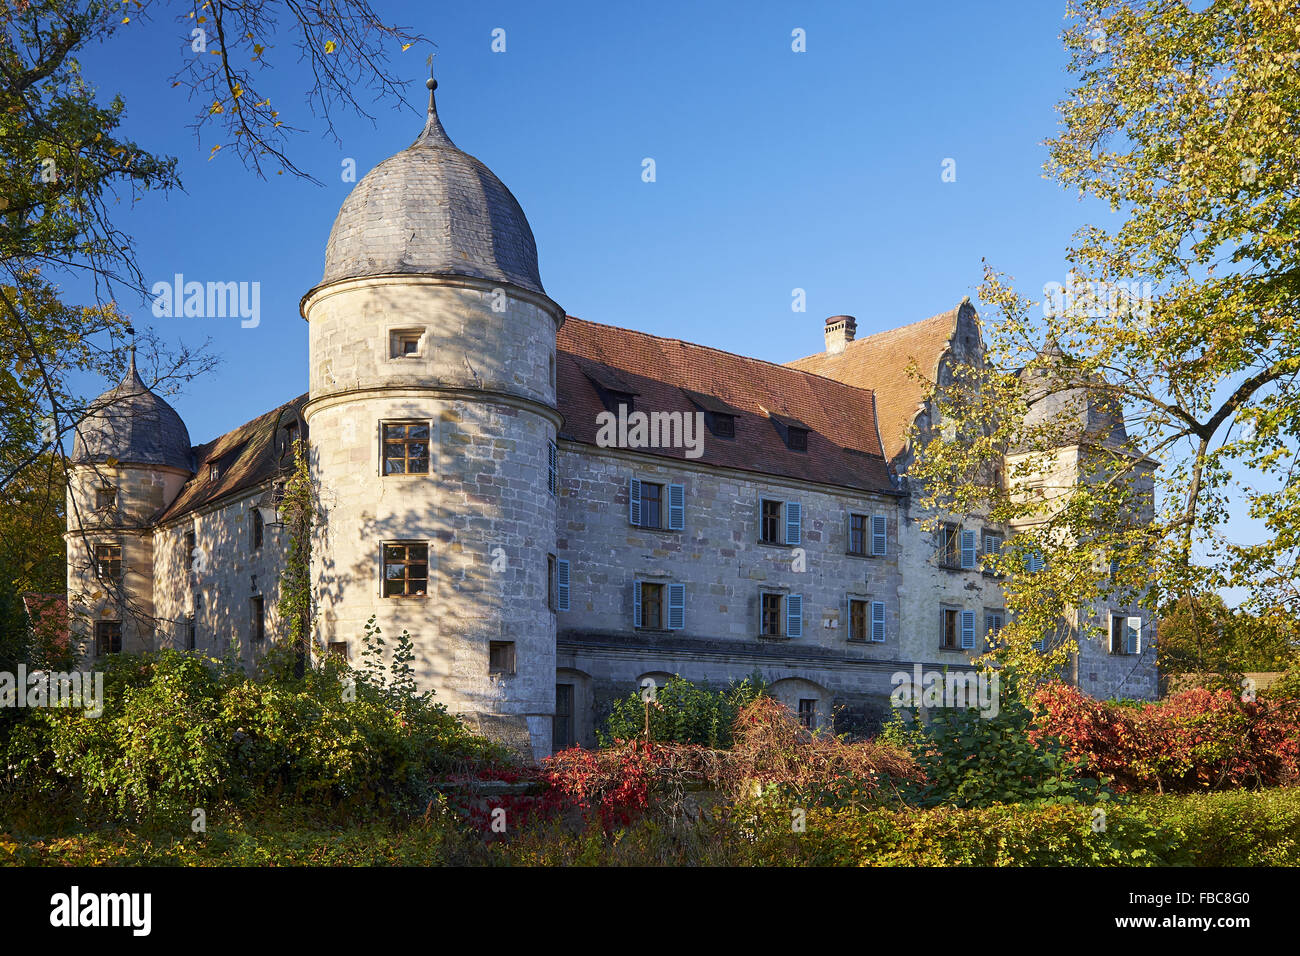 Castle Mitwitz, Bavaria, Germany - Stock Image